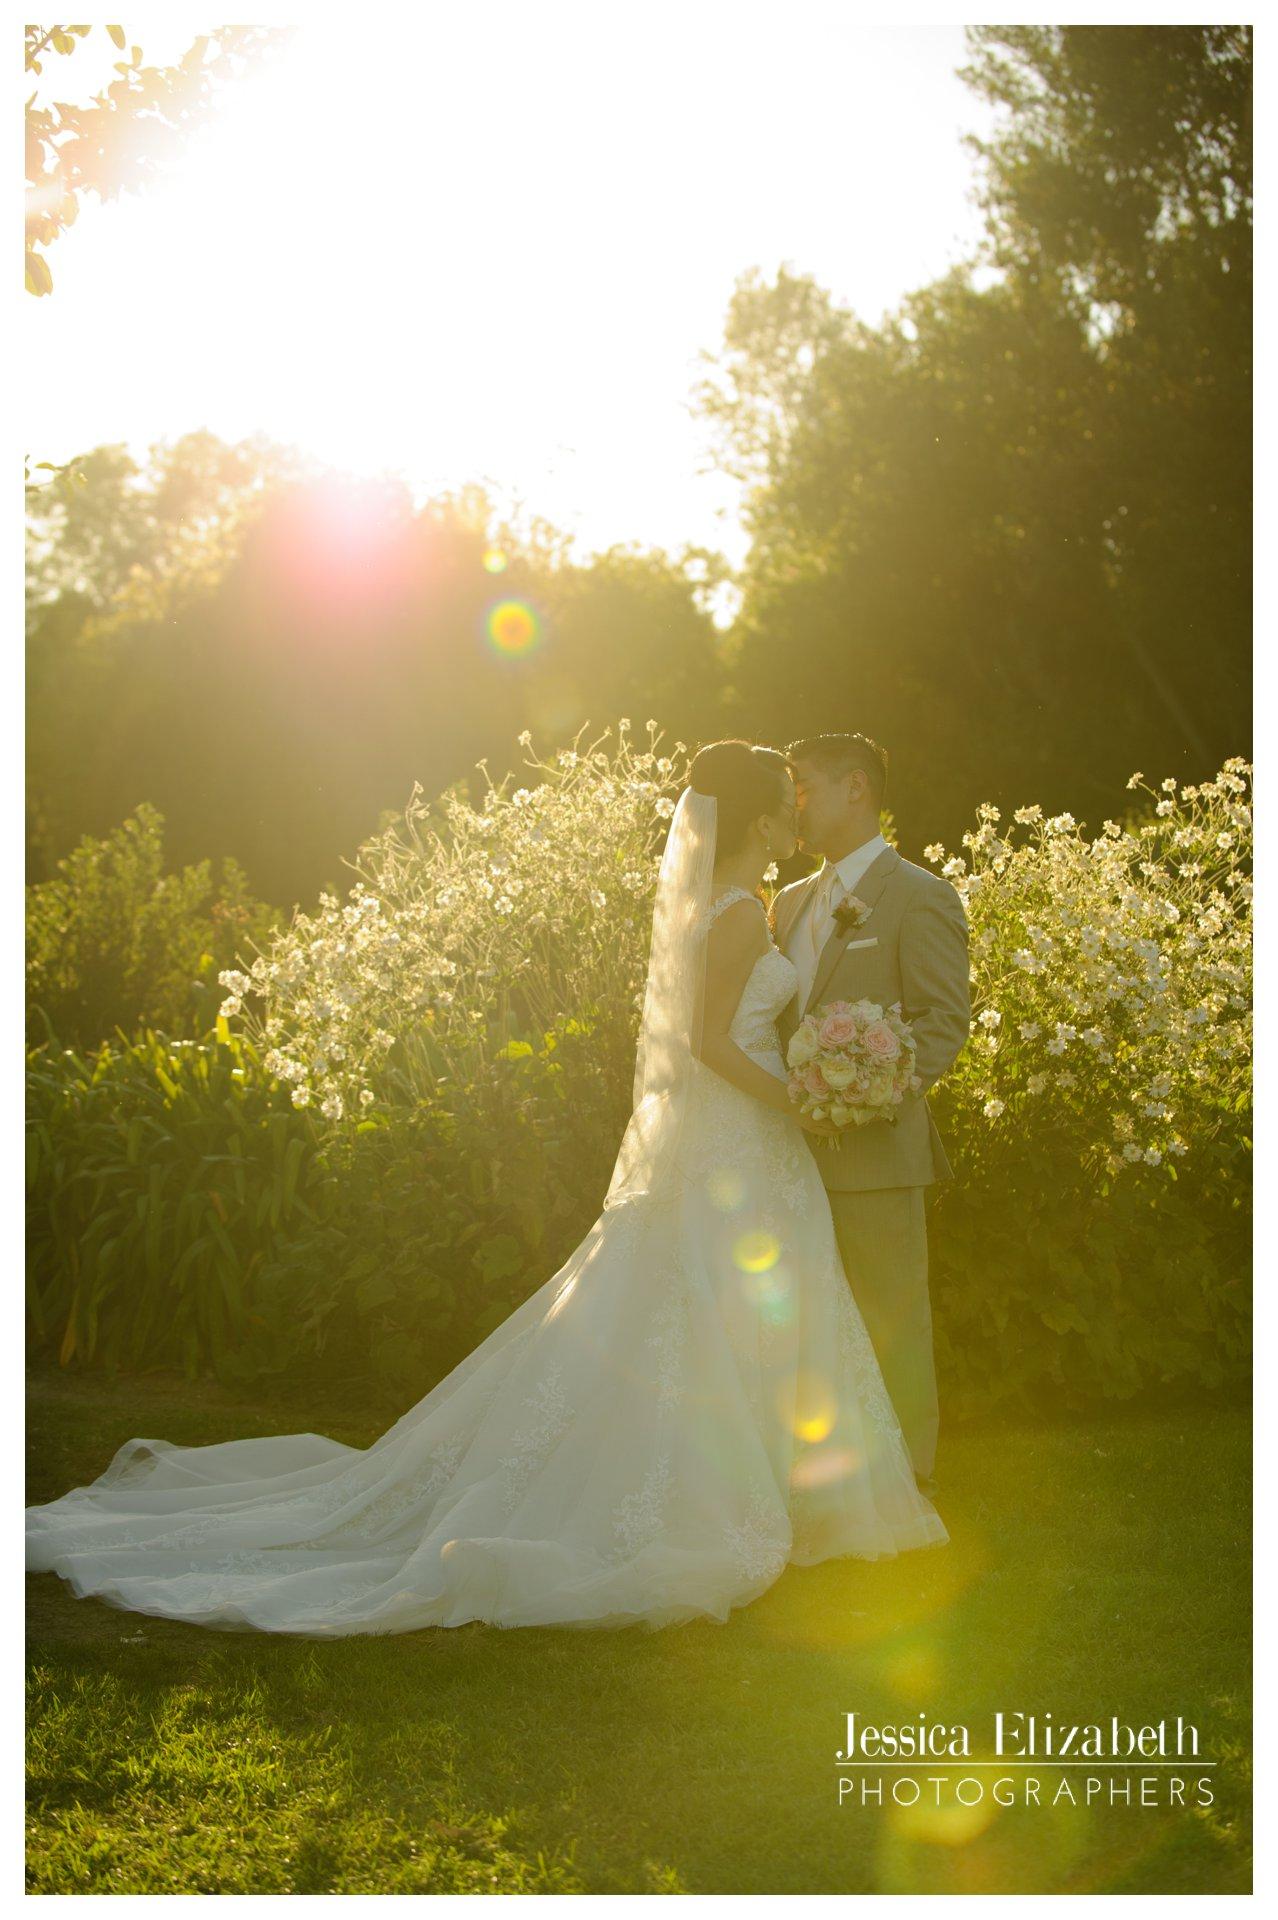 24-South-Coast-Botanic-Garden-Palos-Verdes-Wedding-Photography-by-Jessica-Elizabeth.jpg